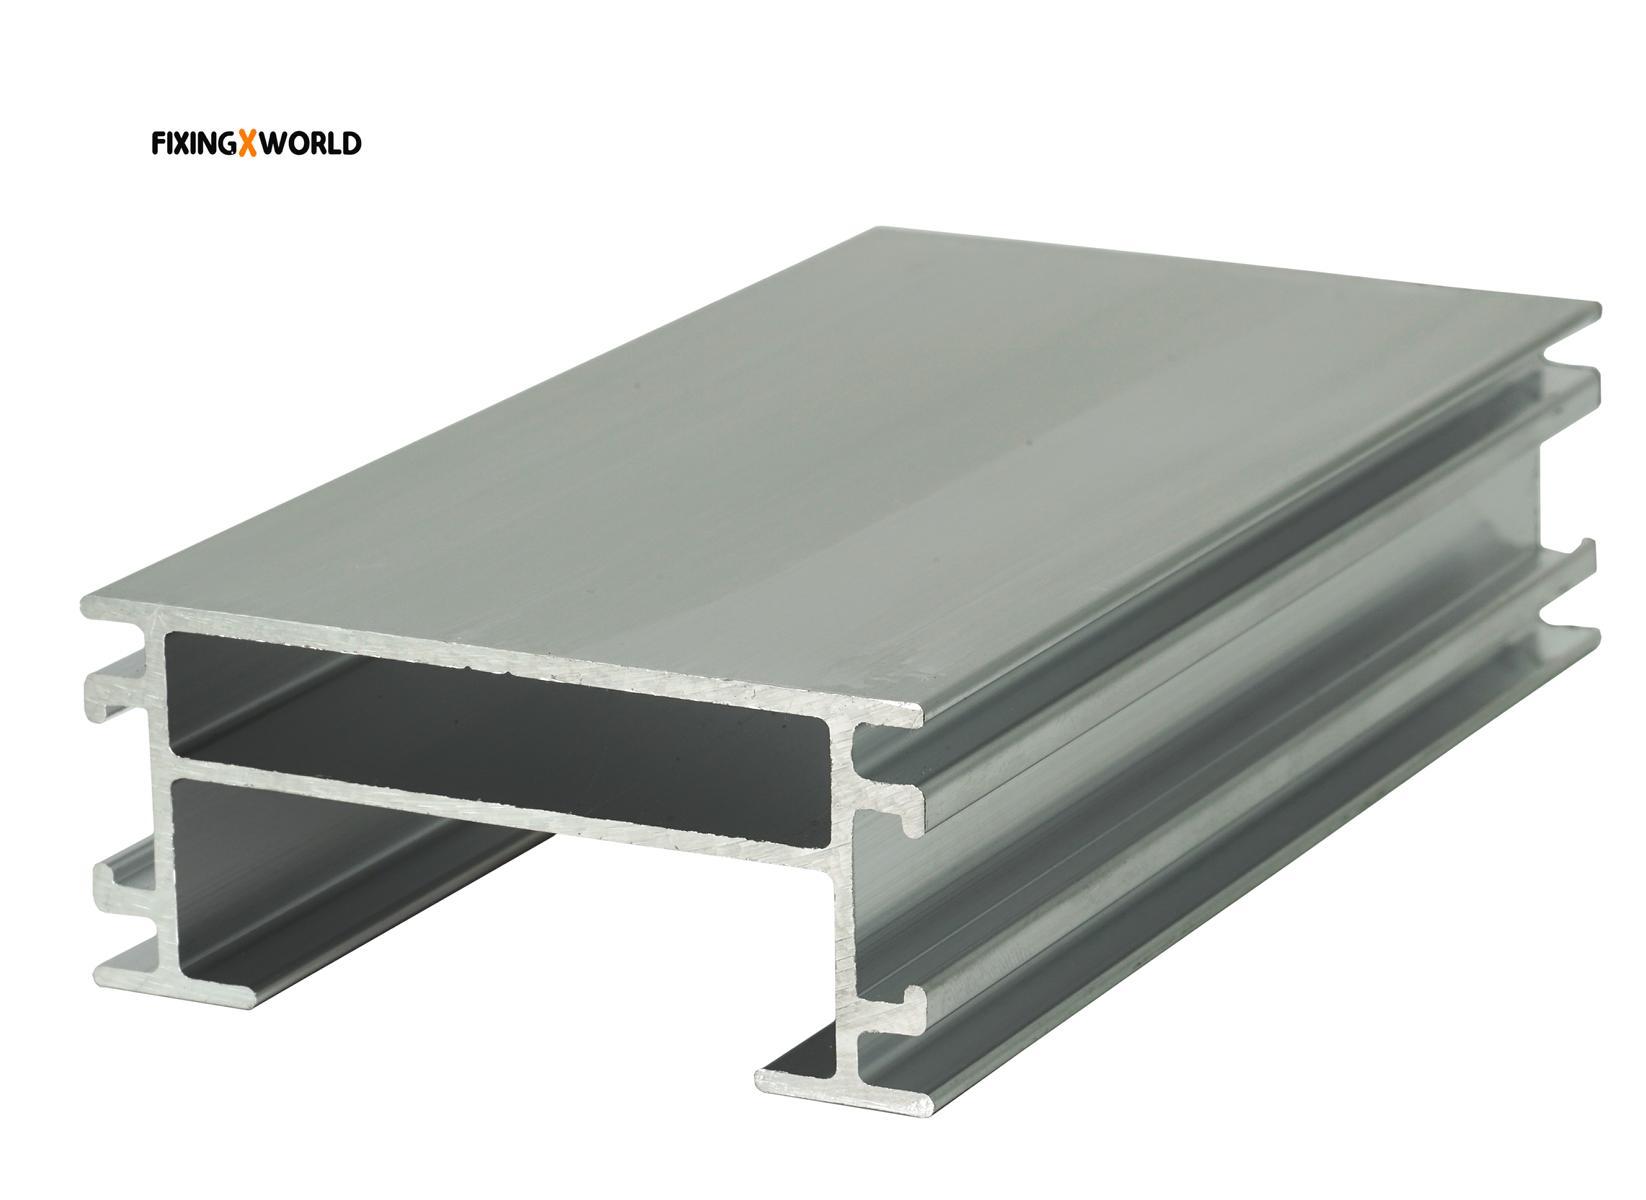 relo u aluminium - unterkonstruktion 2200x64x28mm-x011700000